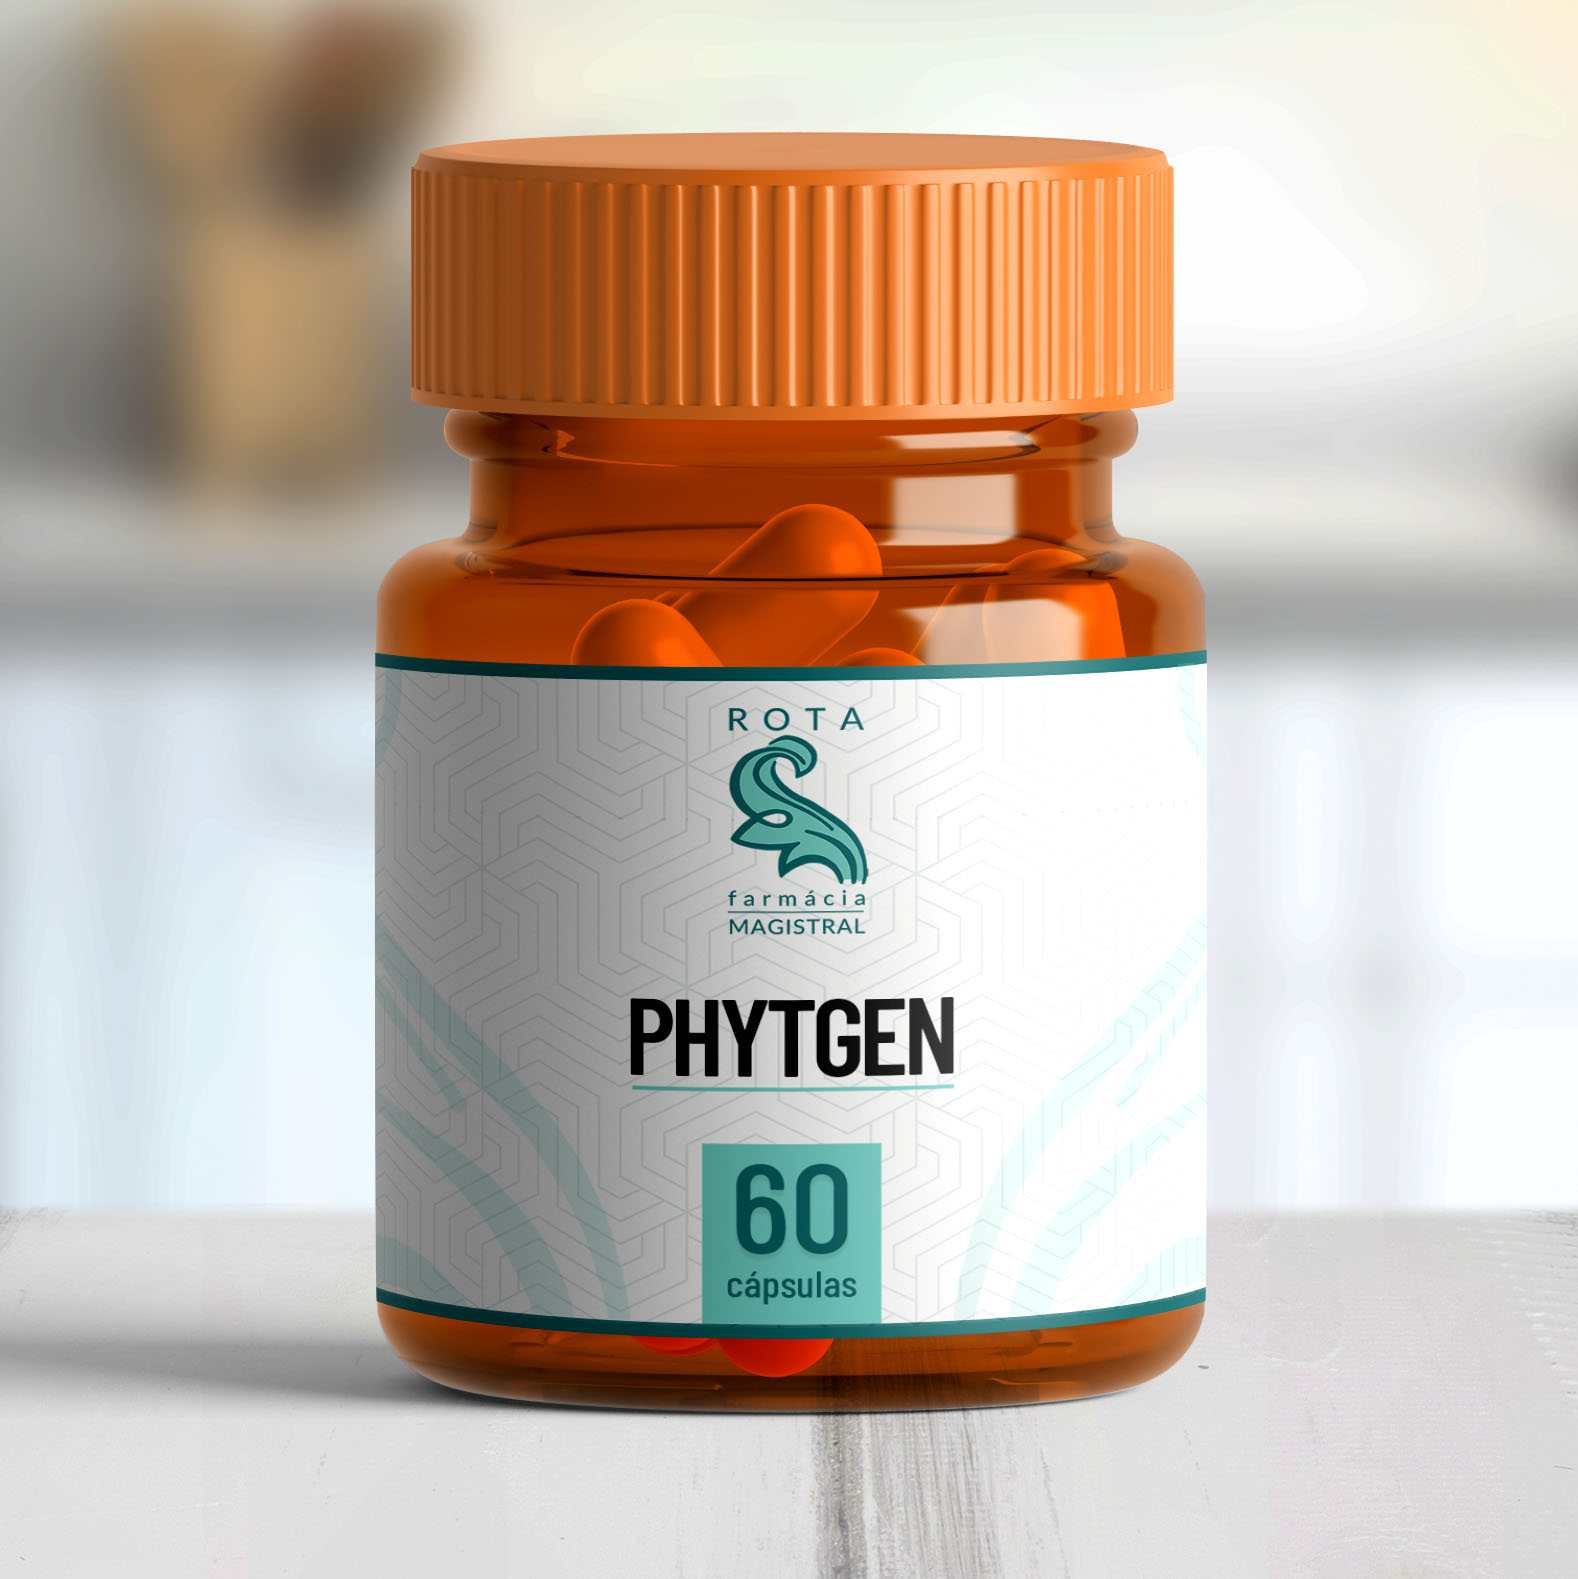 Phytgen ® 200mg 60 cápsulas